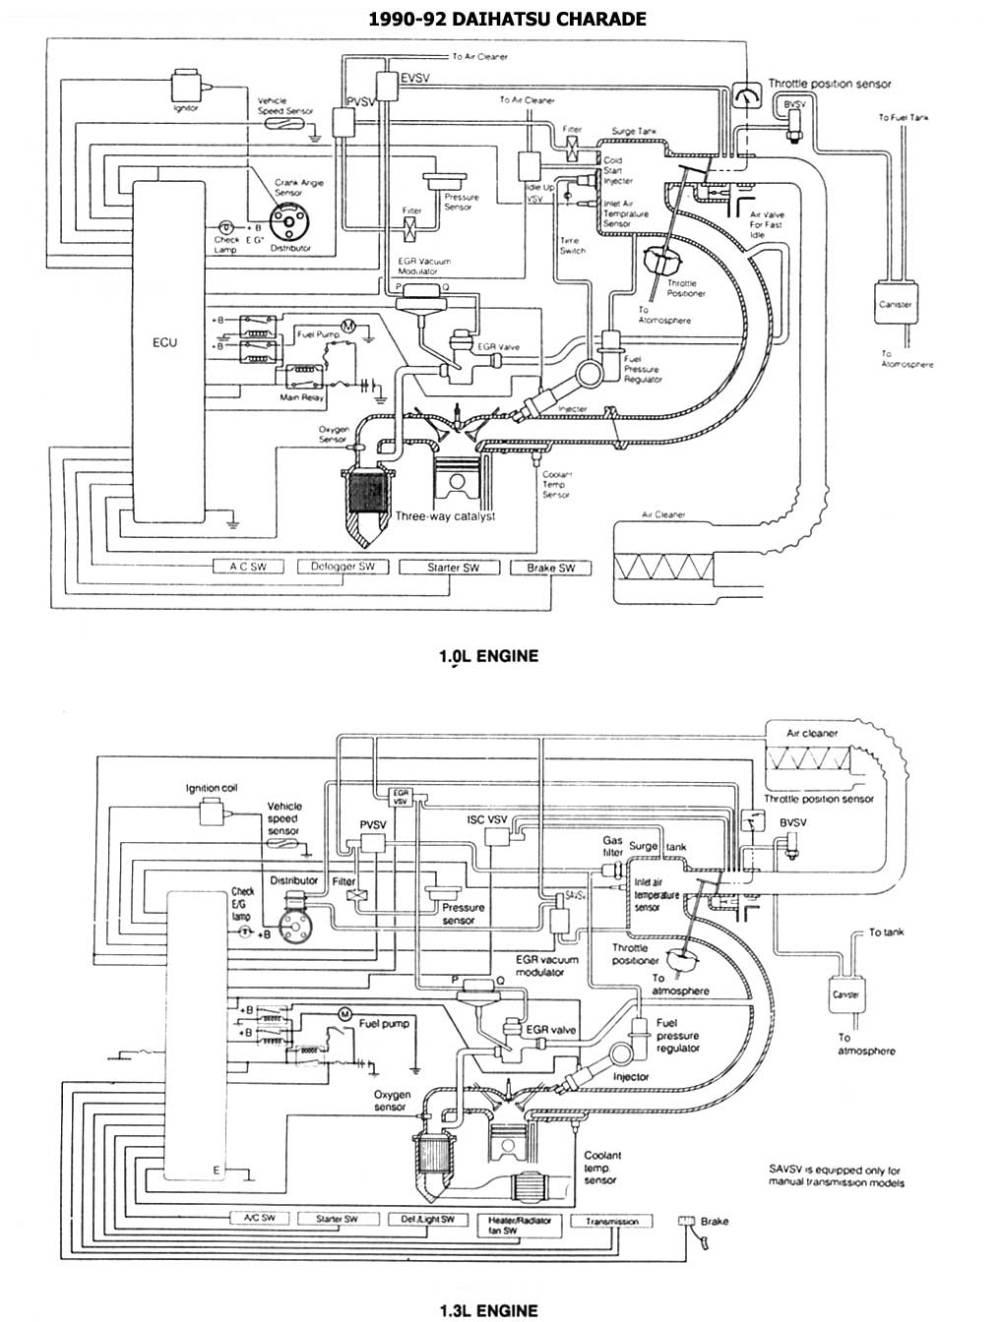 medium resolution of kia pride electrical wiring diagram pdf images gallery